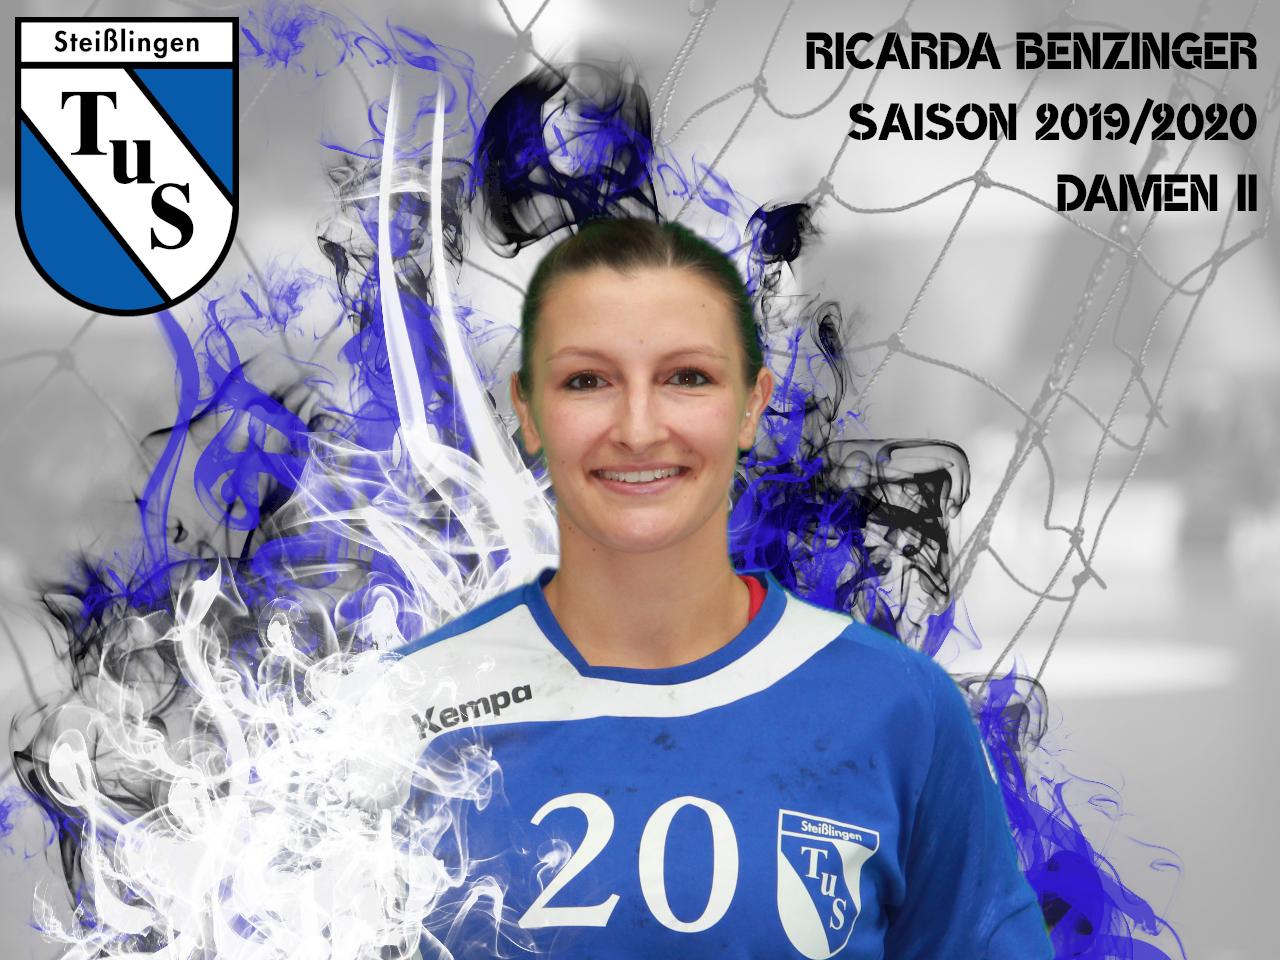 Ricarda Benzinger